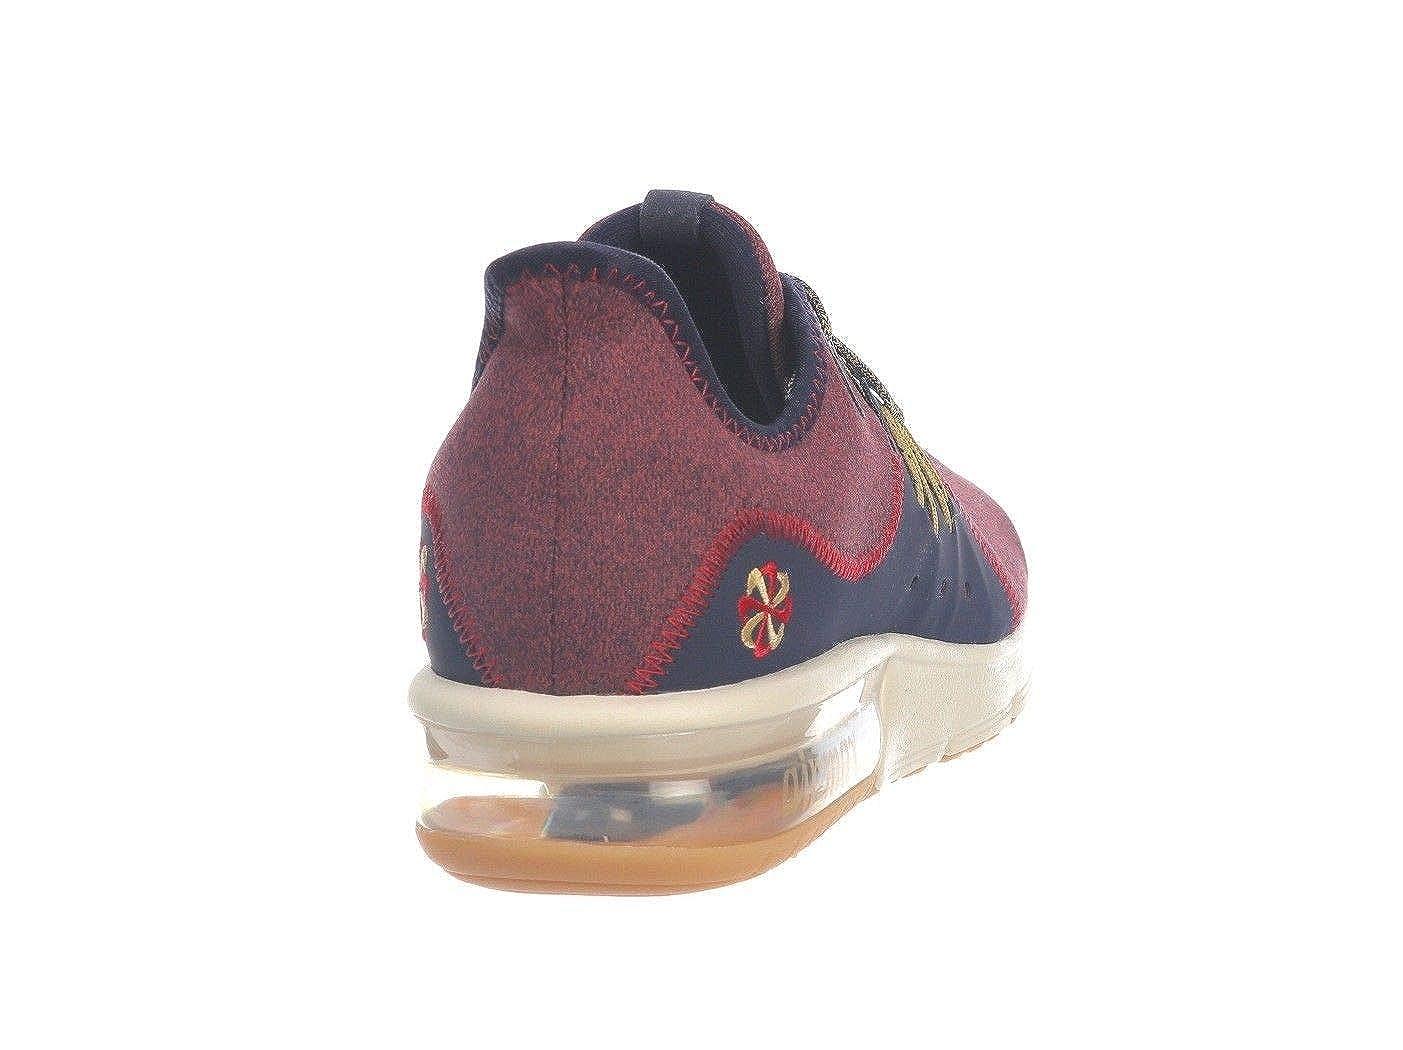 Nike Herren Air Max Sequent Sequent Sequent 3 PRM VST Laufschuhe eadbee